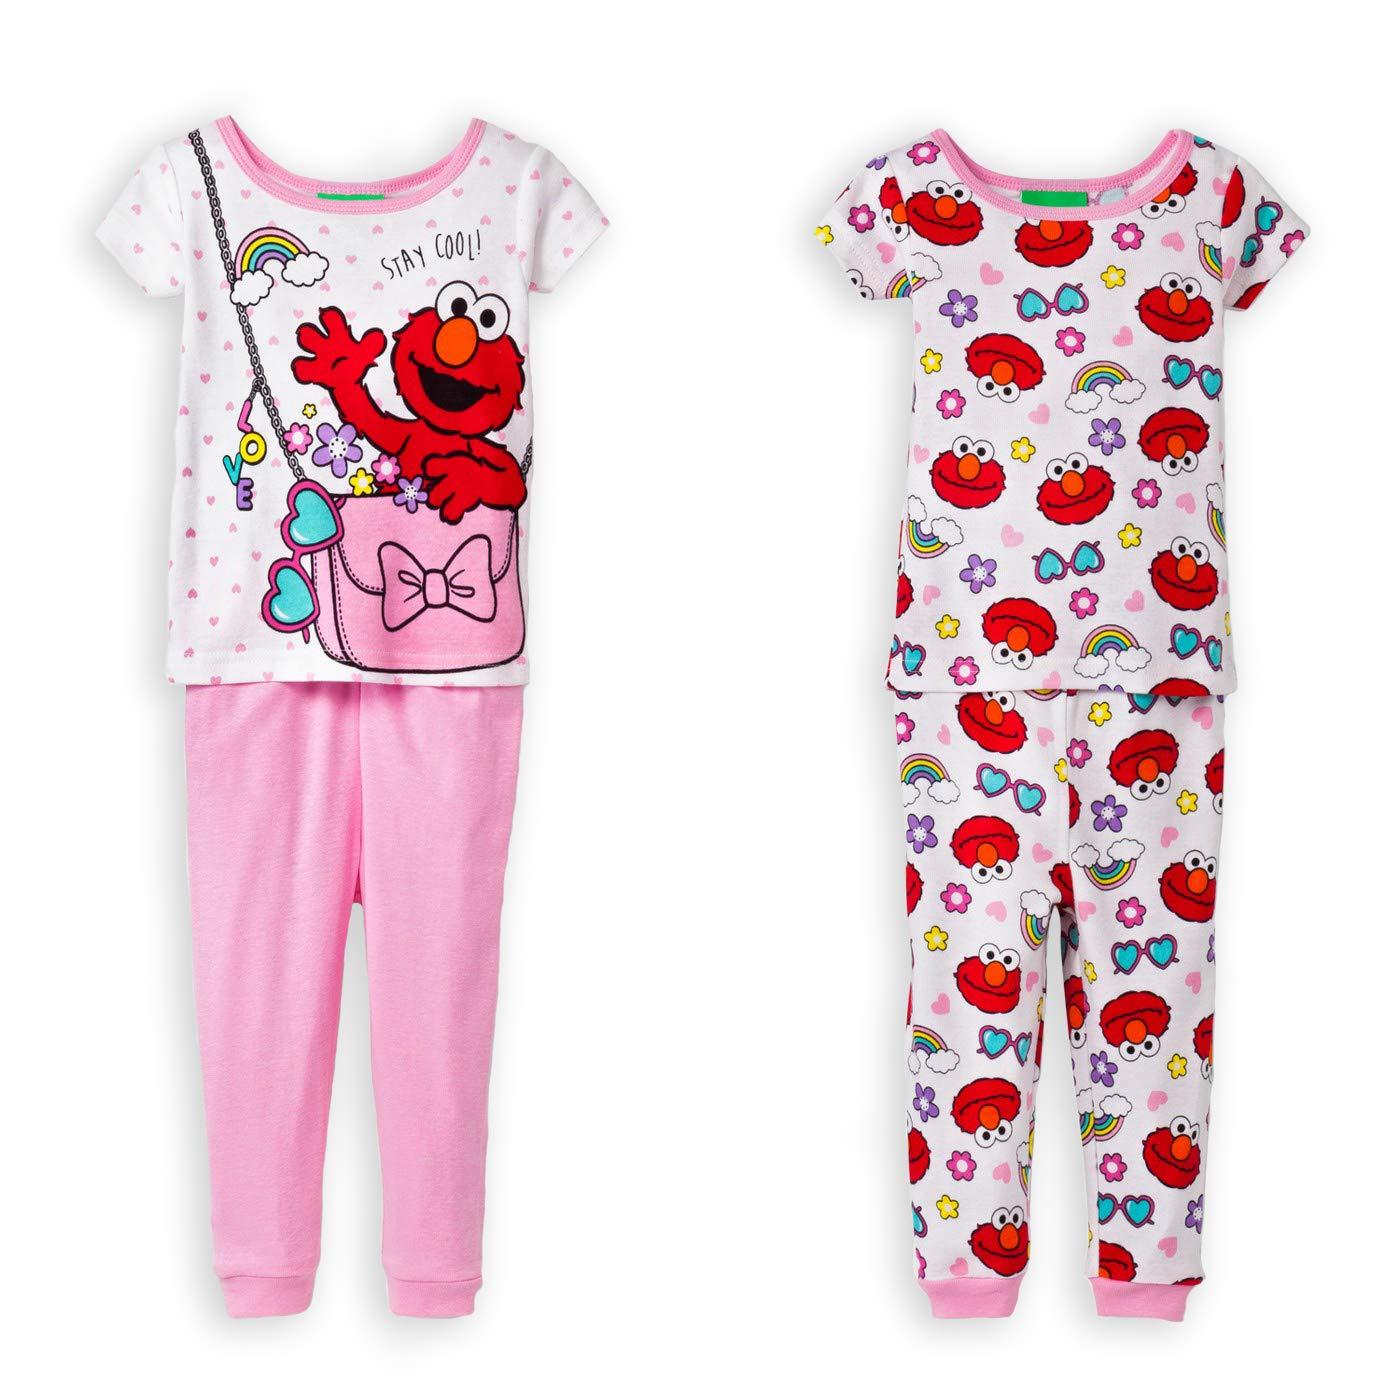 Sesame Street Elmo Stay Cool Girls 4-Piece Cotton Pajama Set SS247TSL4T